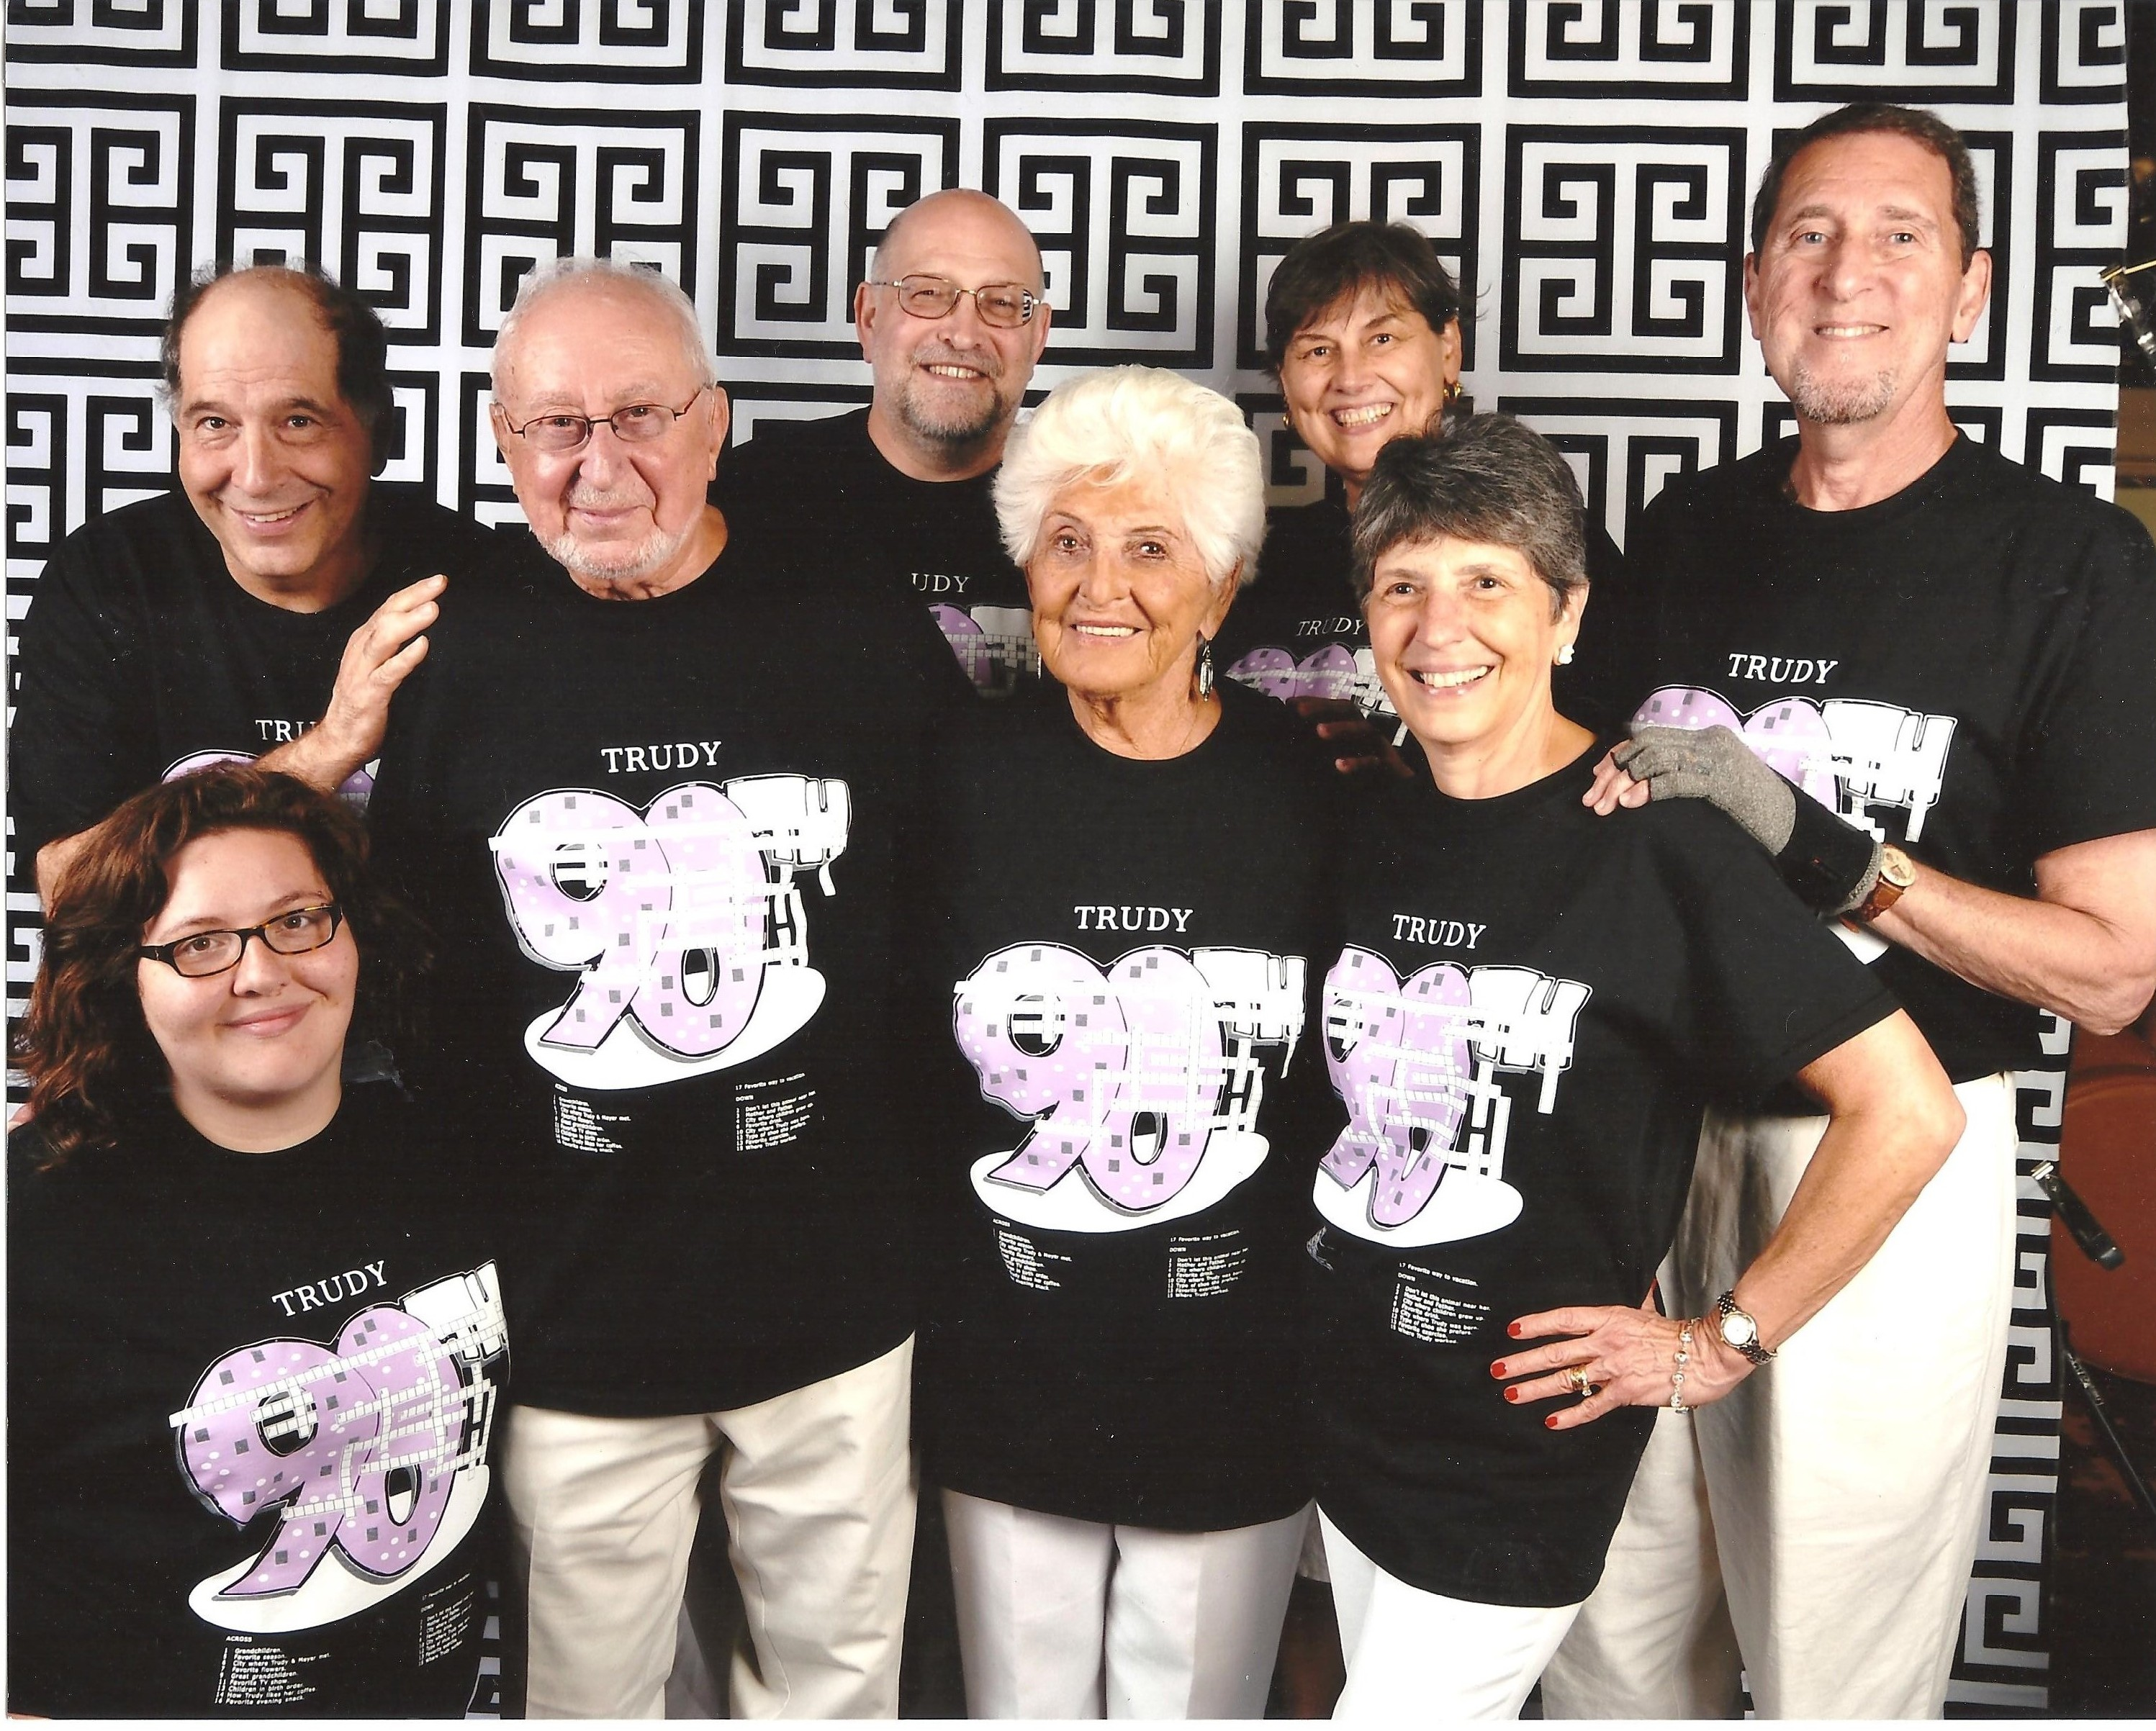 90th Birthday T-Shirt Design Ideas - Page 2